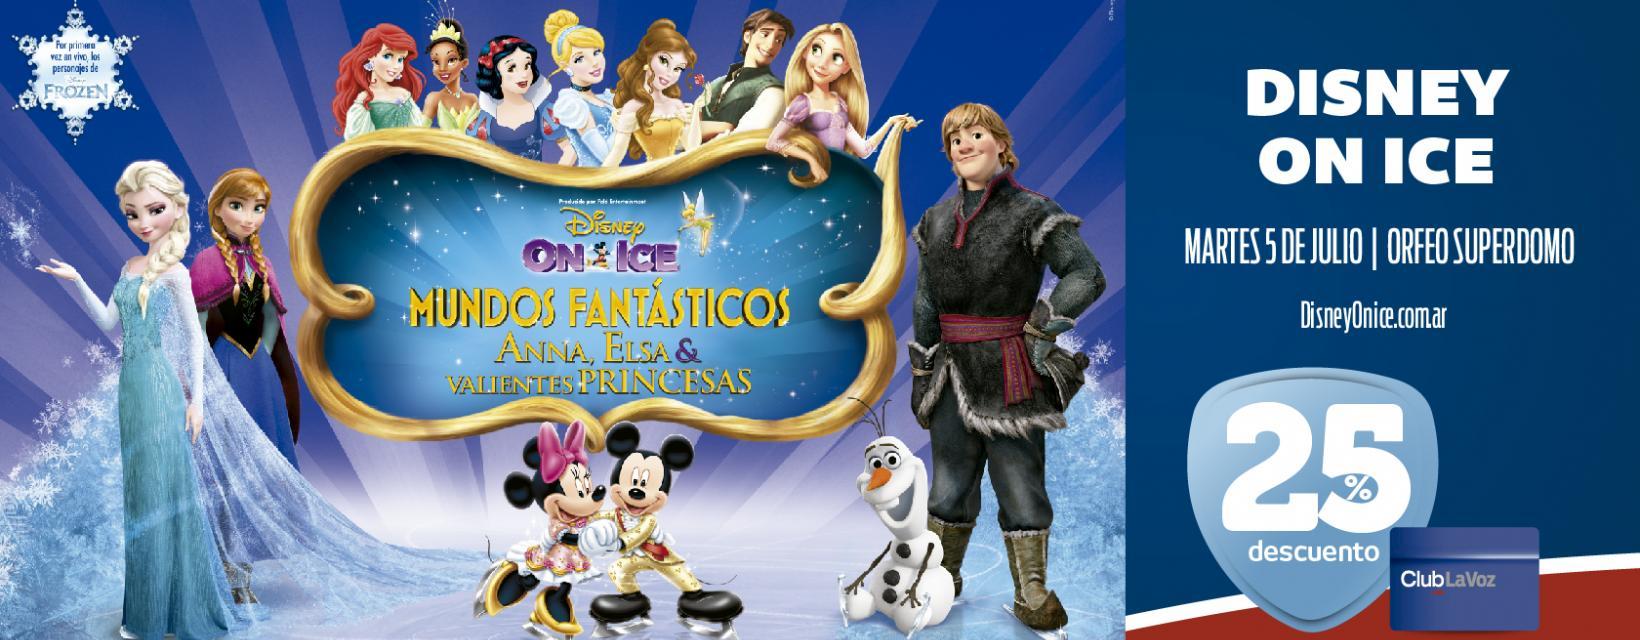 Disney On Ice 2016 BANNER